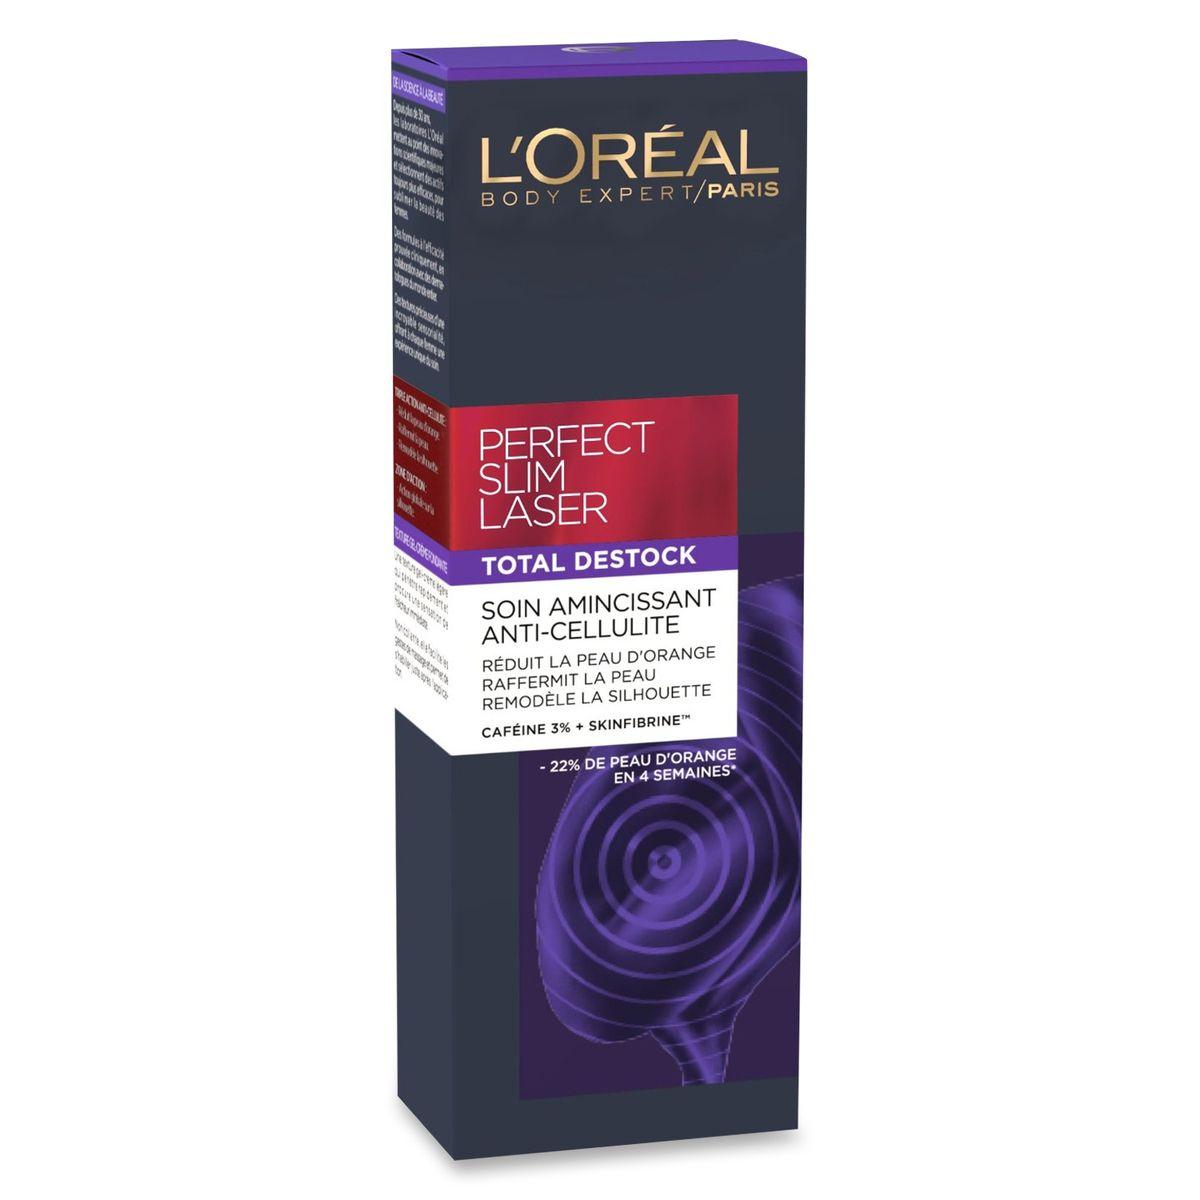 L'Oréal body expert perfect slimlaser total destock 125ml